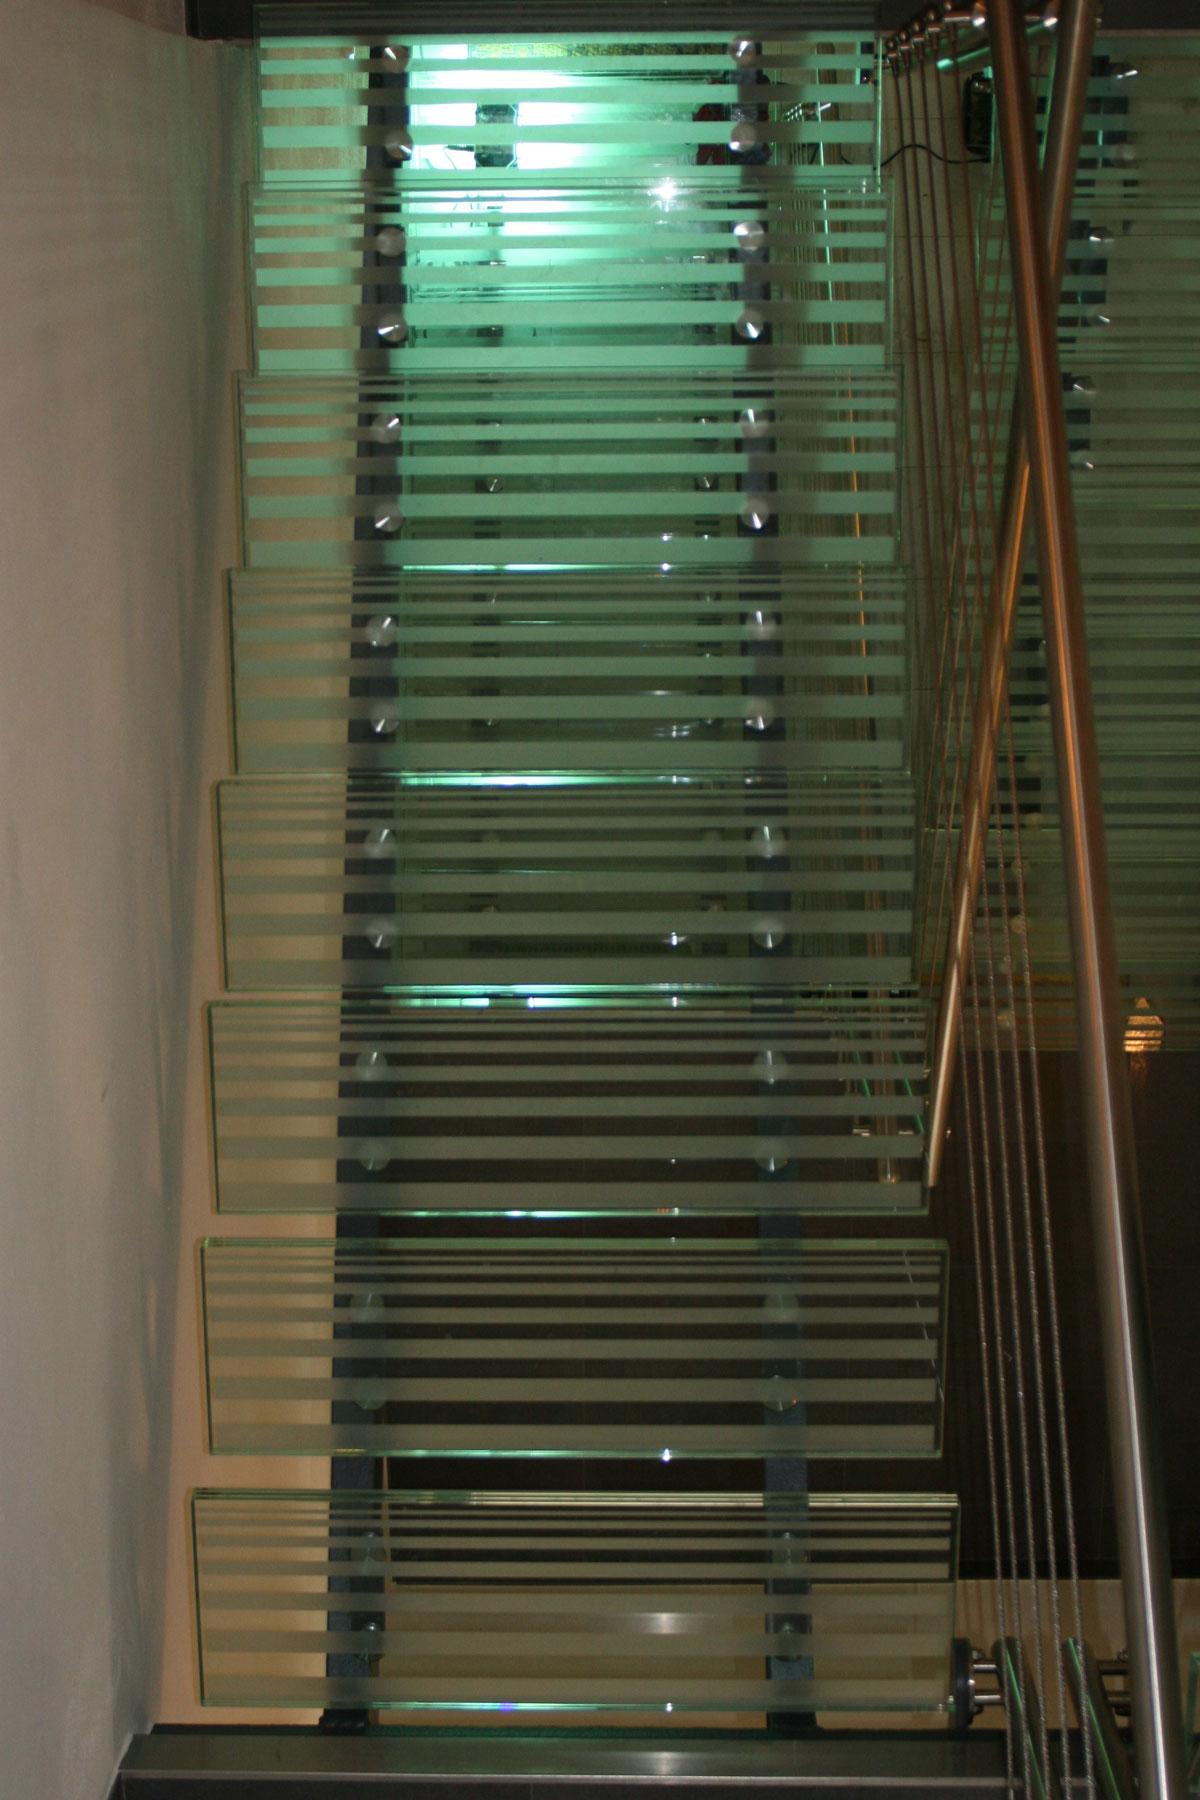 Sklenarstvi-Prerost-schody-a- pochozi-sklo (18)